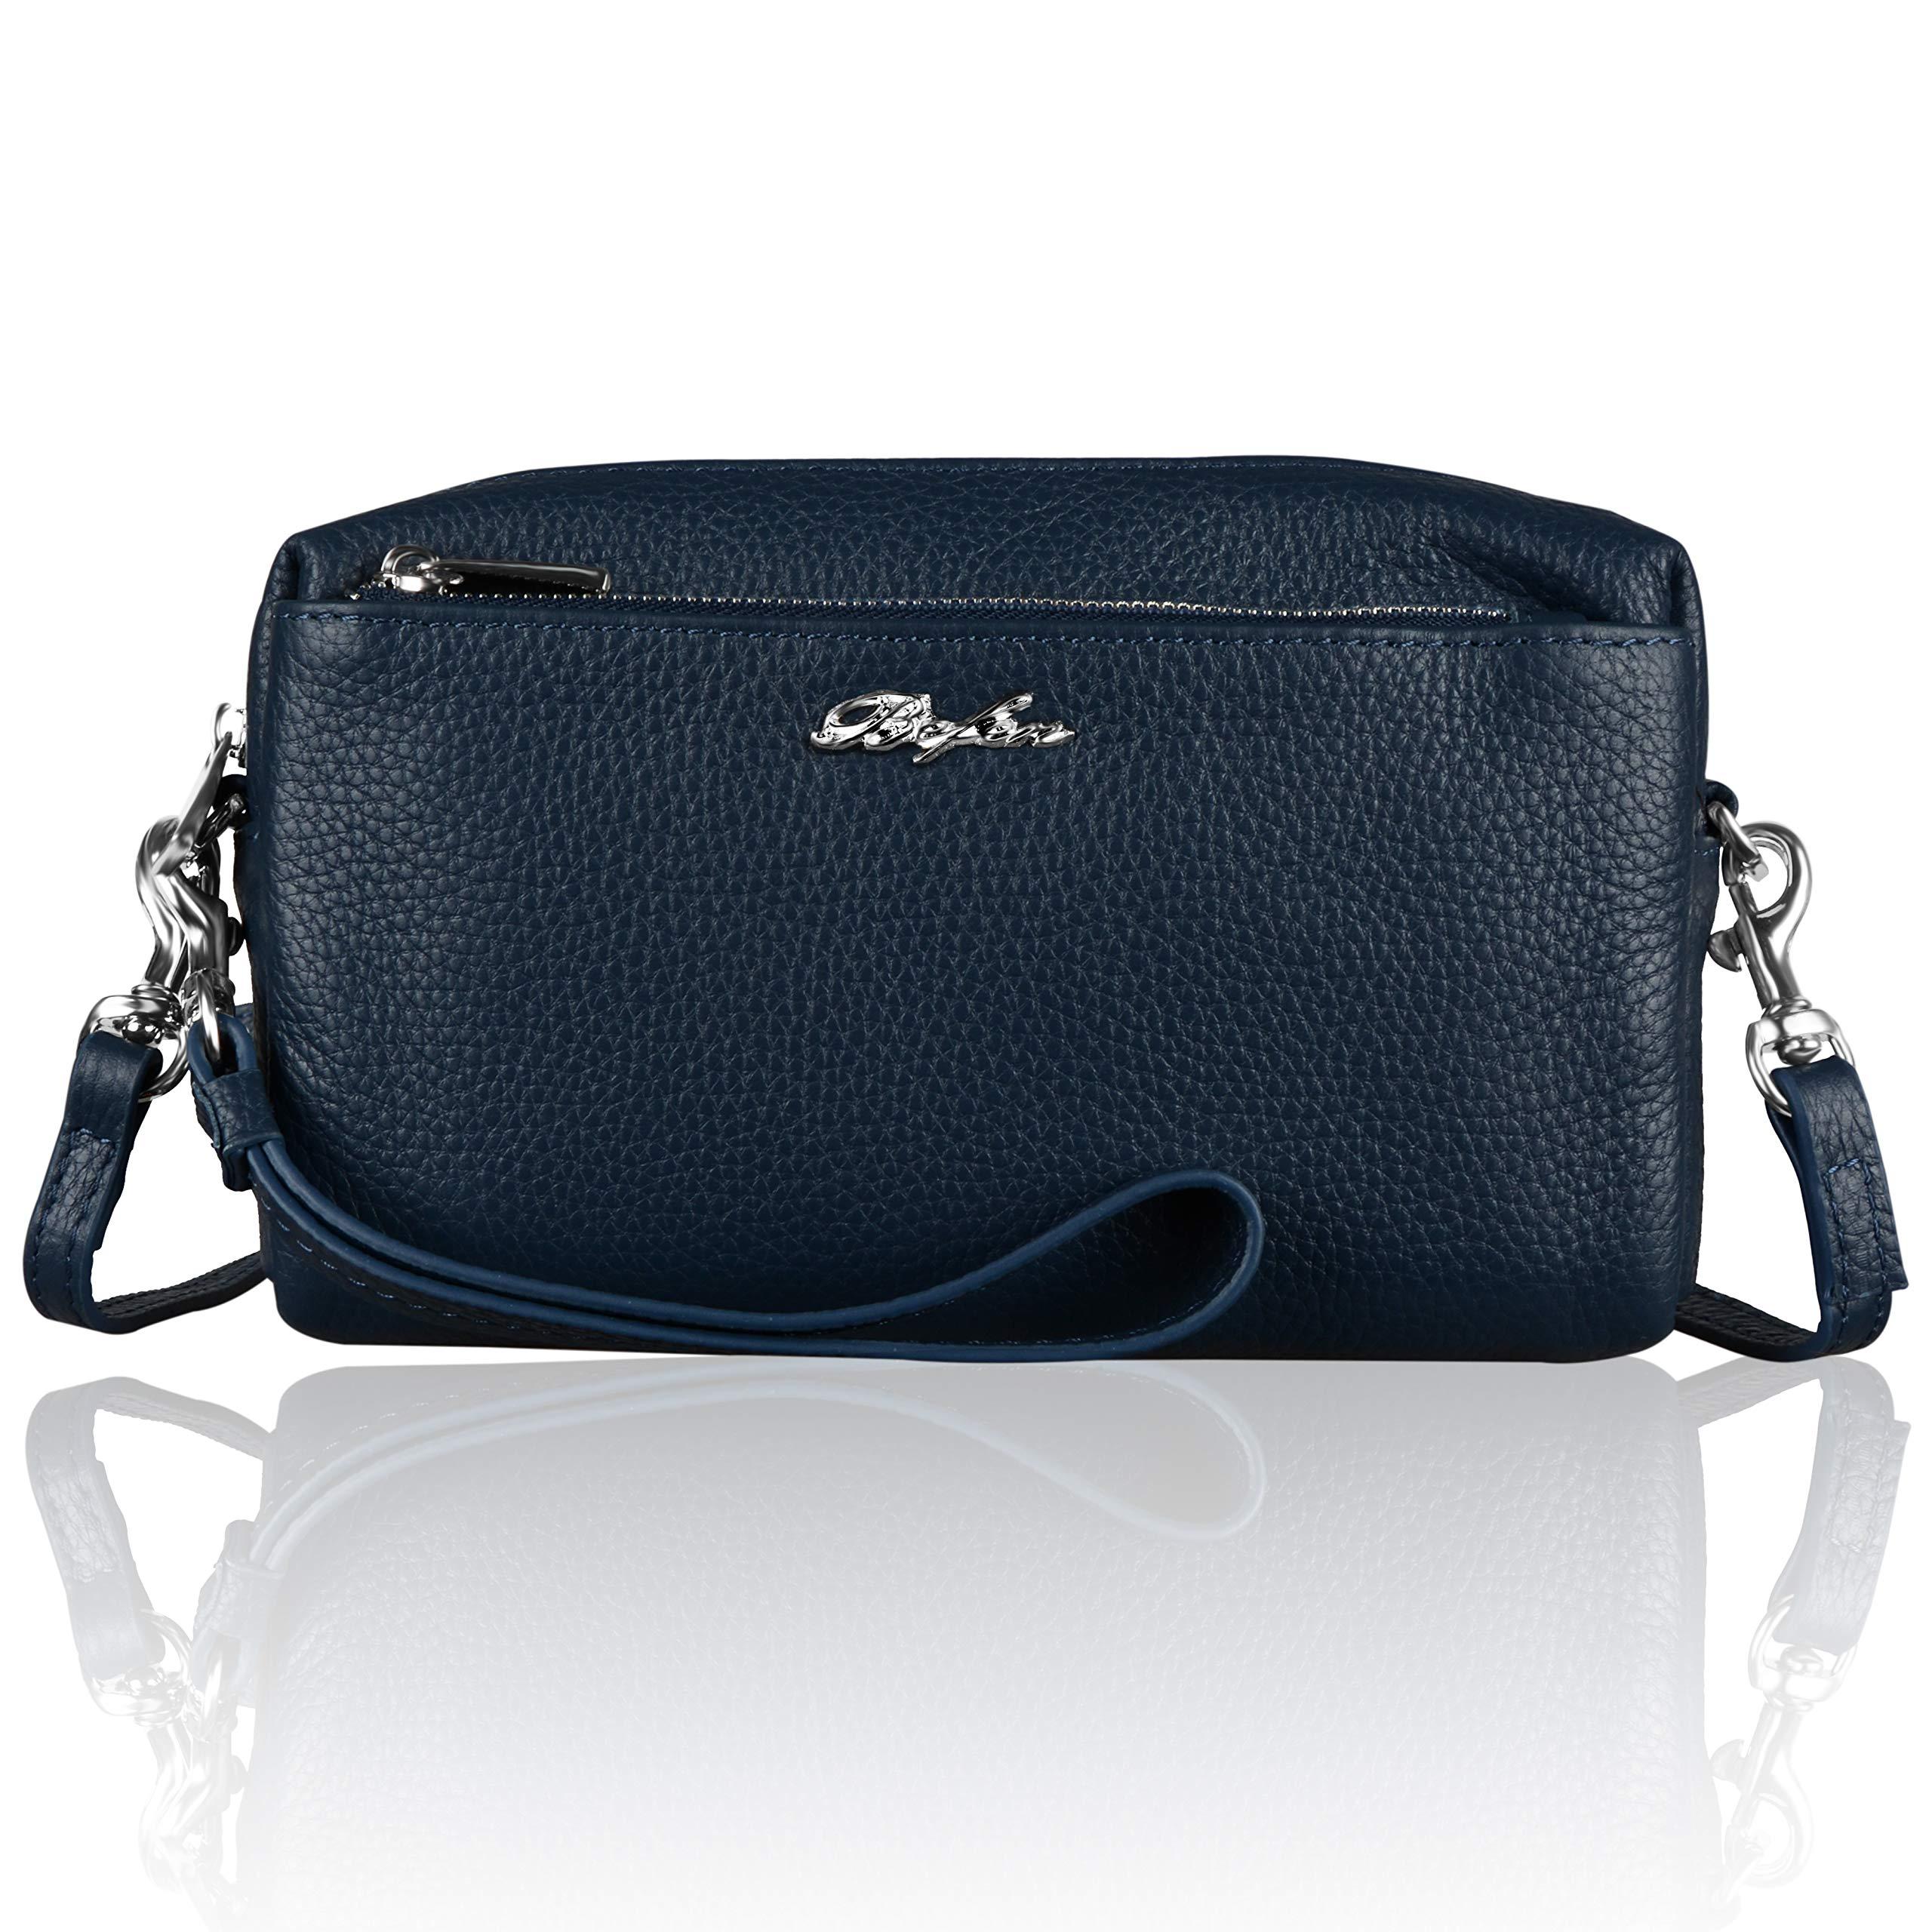 Galleon - Befen Women Full Grain Leather Tripple Zip Crossbody Bag Crossbody  Cell Phone Purse Wallet Bag Phone Wristlet - Navy Blue